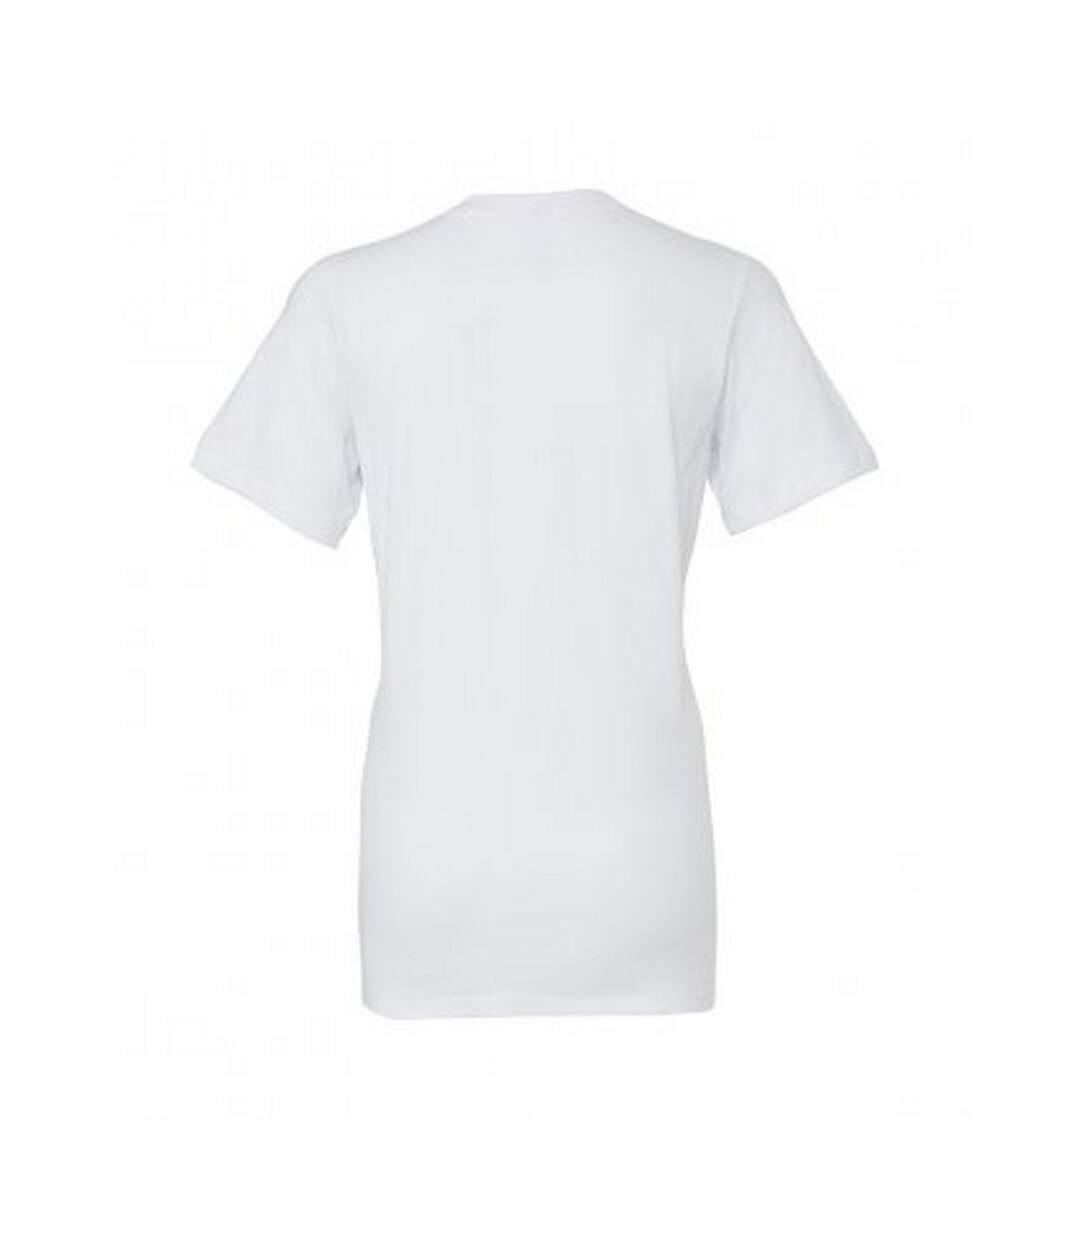 Bella - T-Shirt Jersey - Femme (Blanc) - UTPC3876